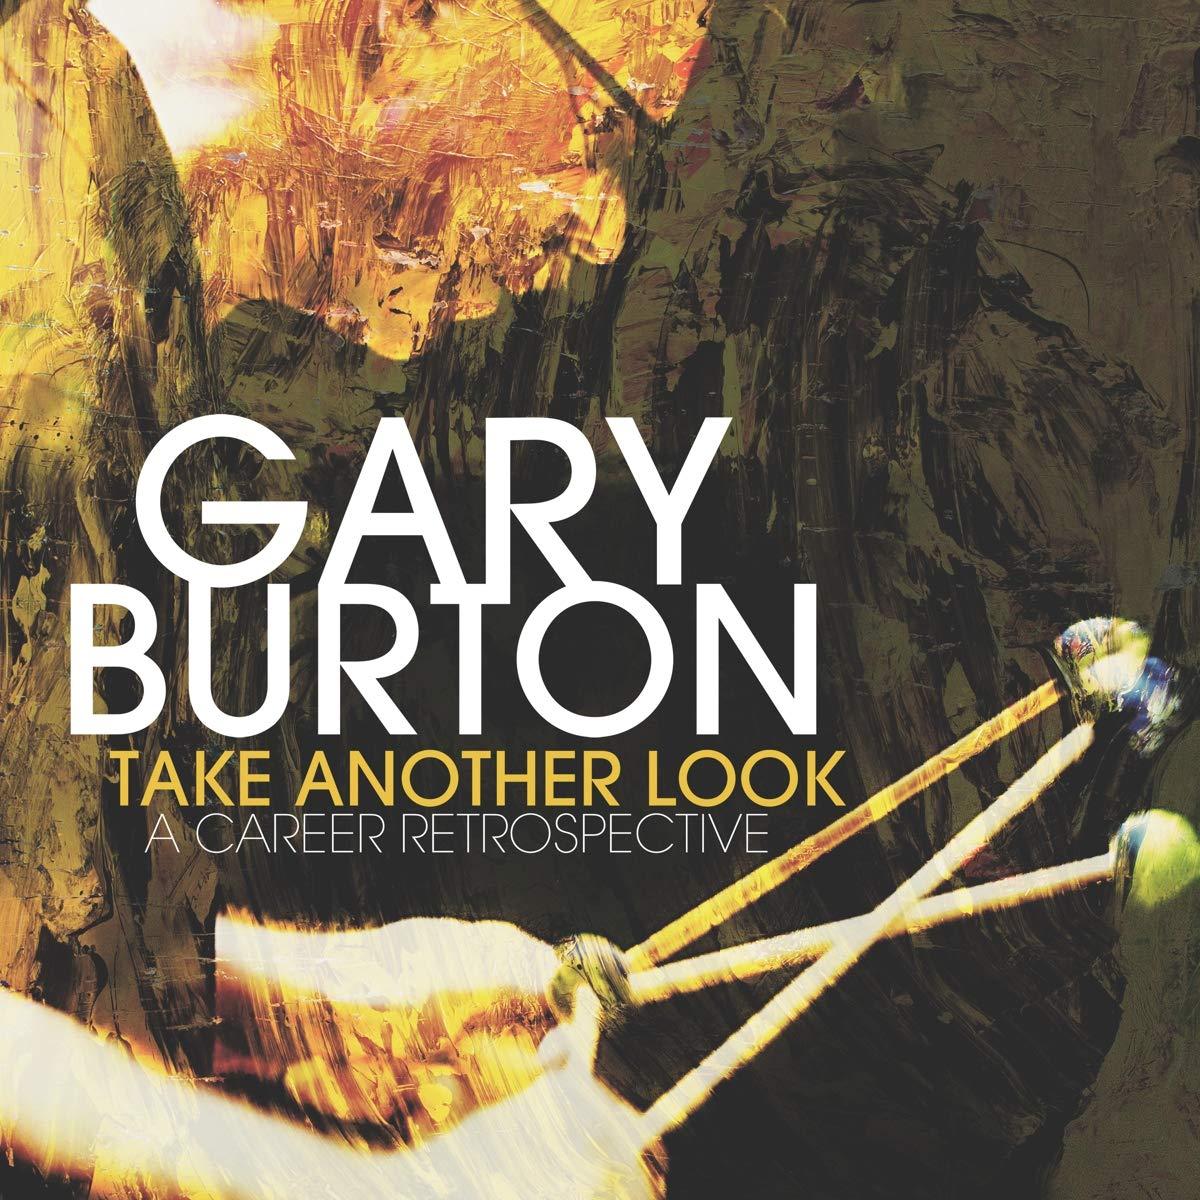 Vinilo : Gary Burton - Take Another Look: A Career Retrospective (LP Vinyl)